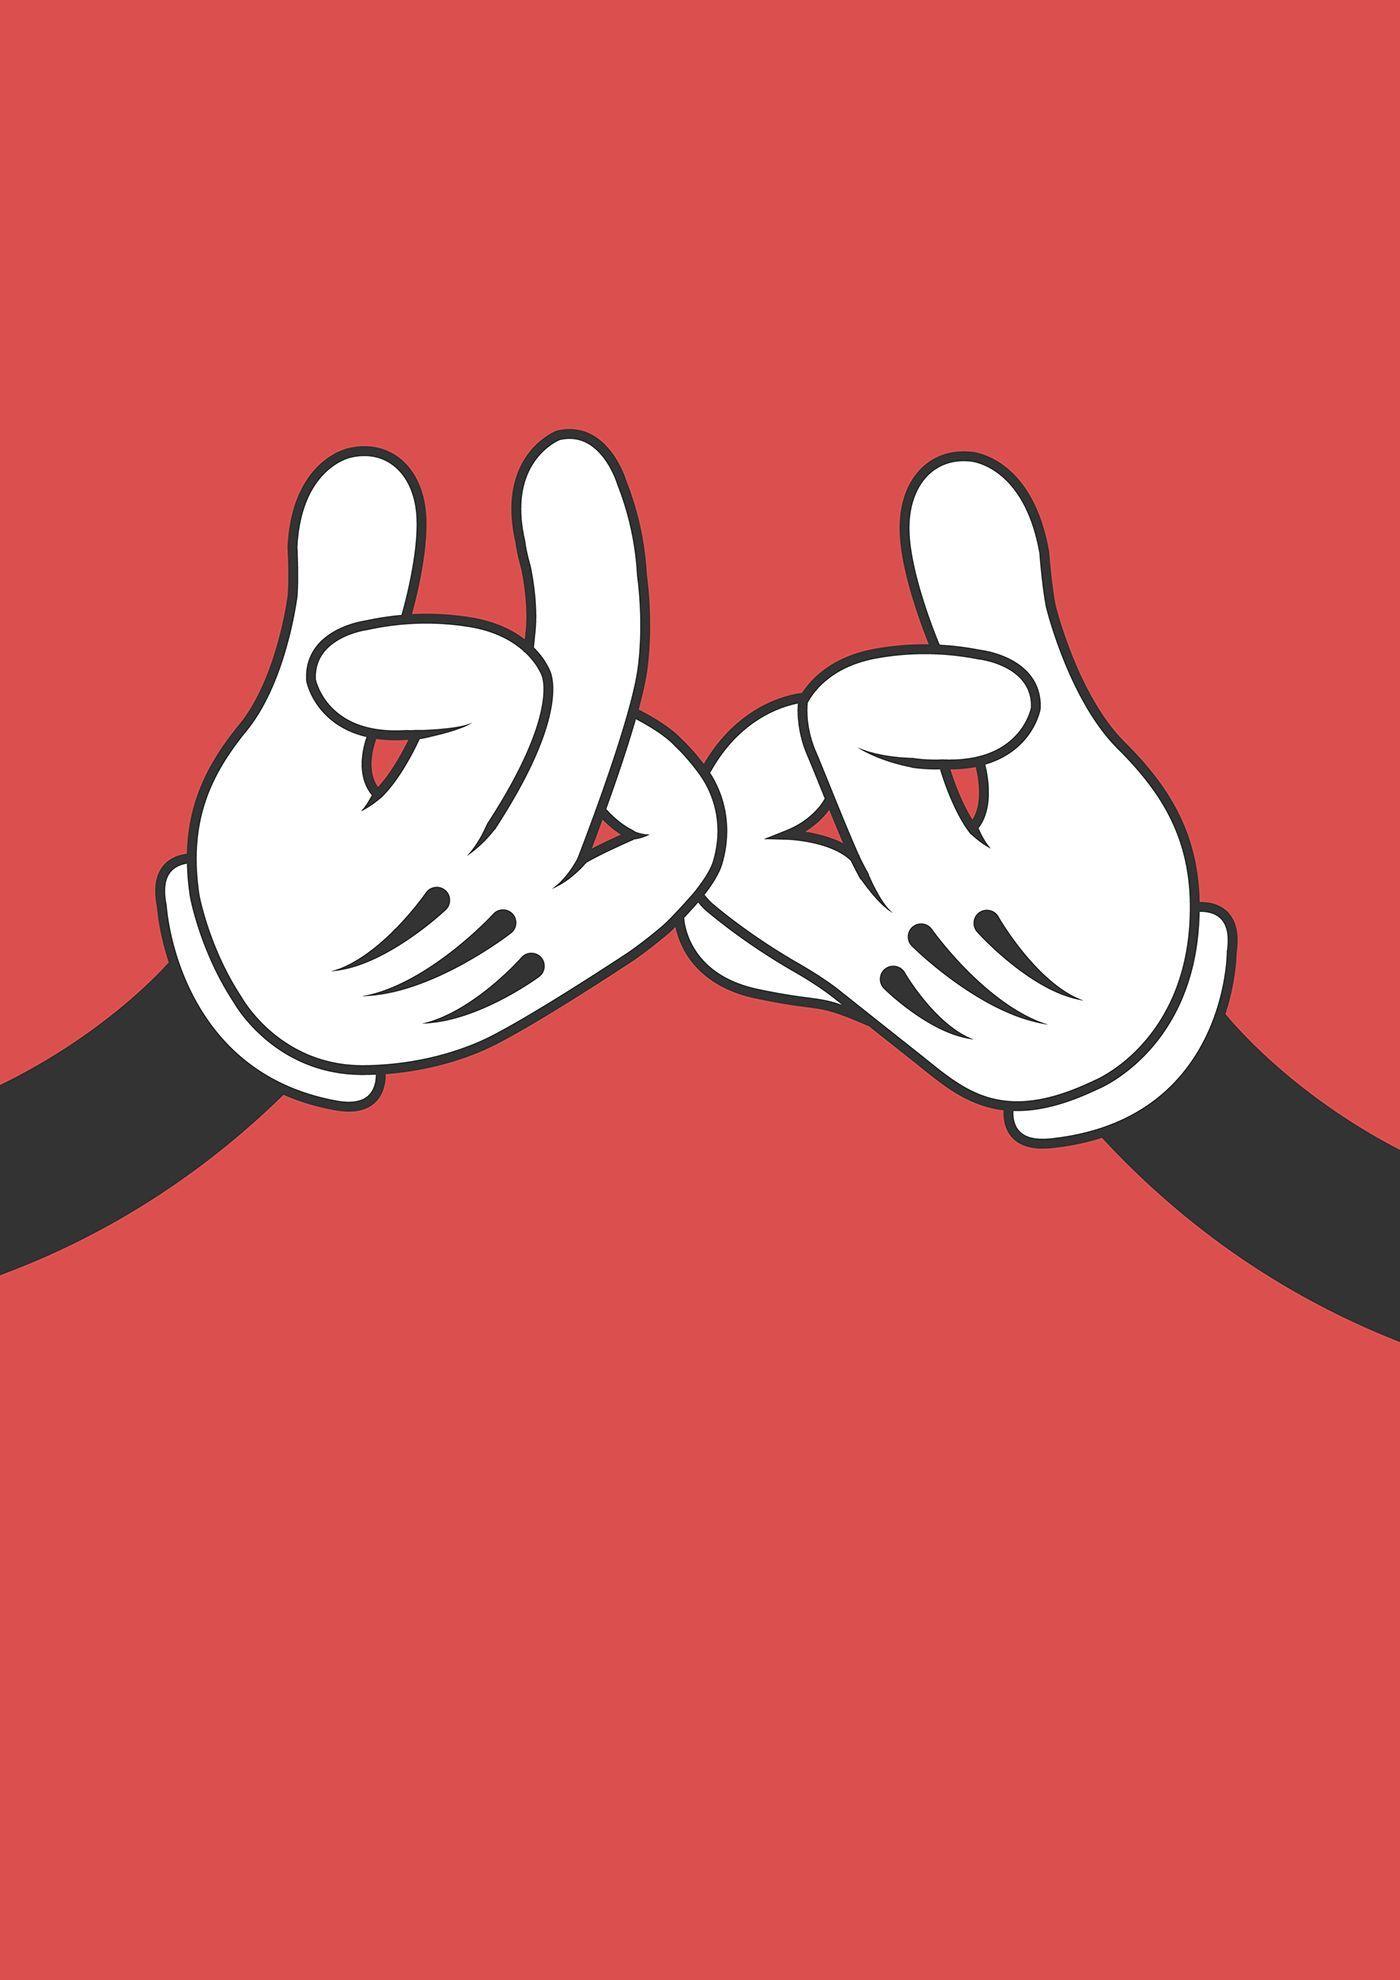 Blood Gang Cartoon : blood, cartoon, Mickey, Wallpapers, WallpaperDog